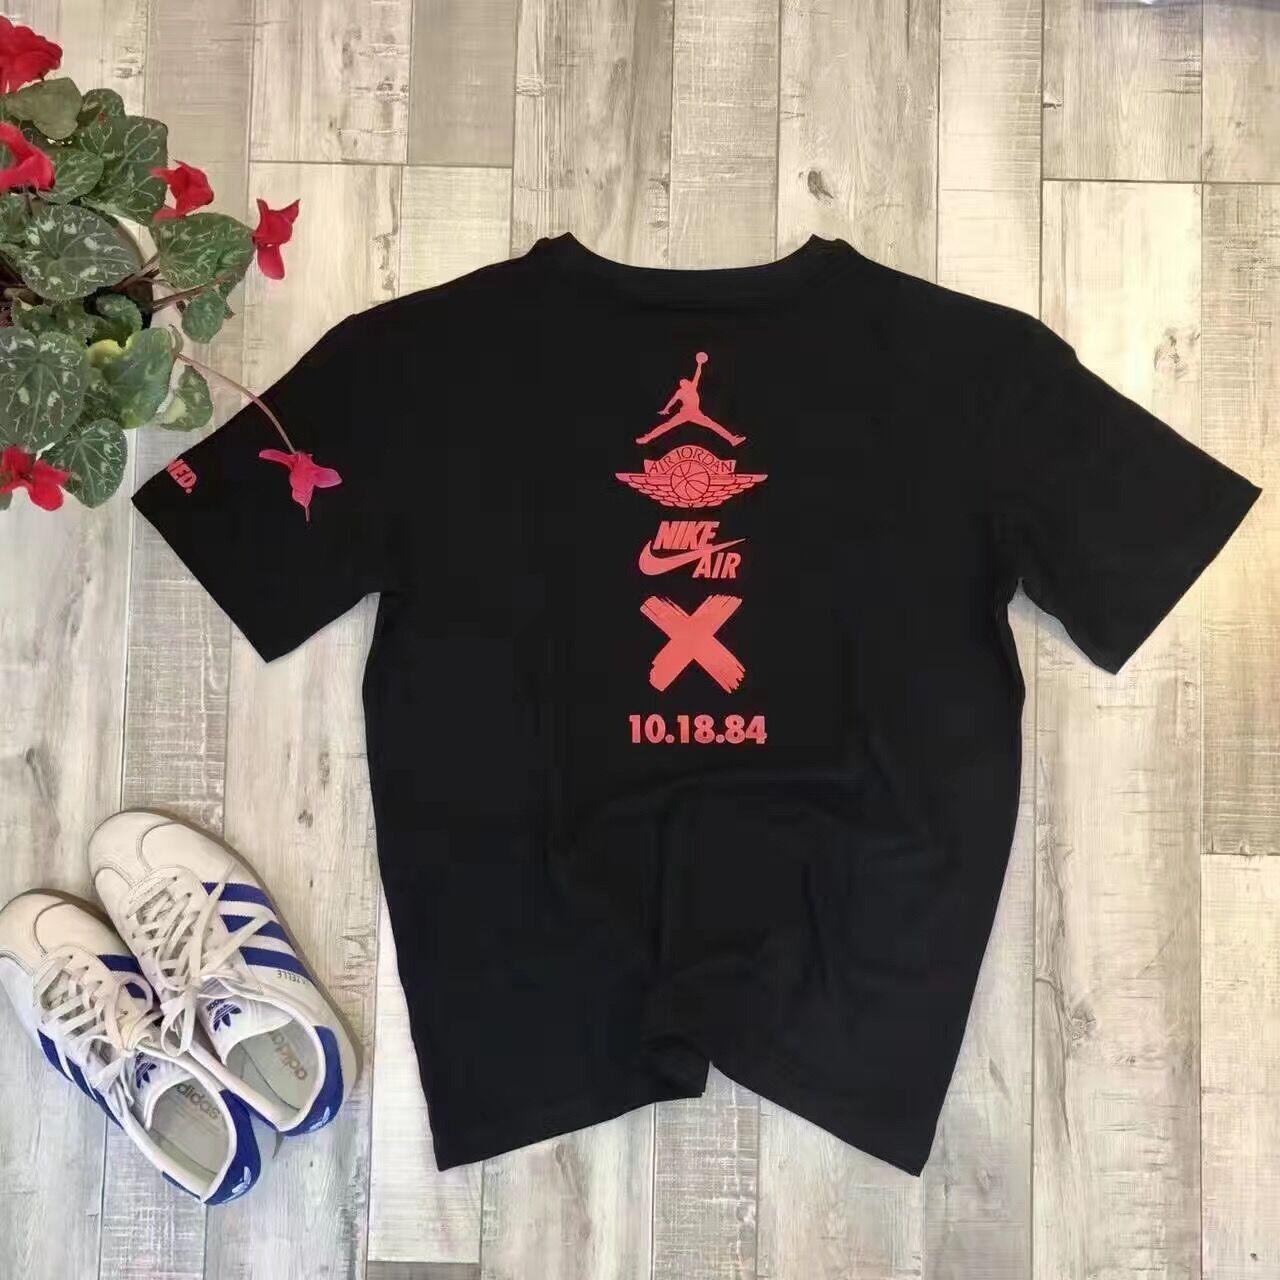 Nike air jordan 1 retro banned x 10 18 84 tee shirt 922067